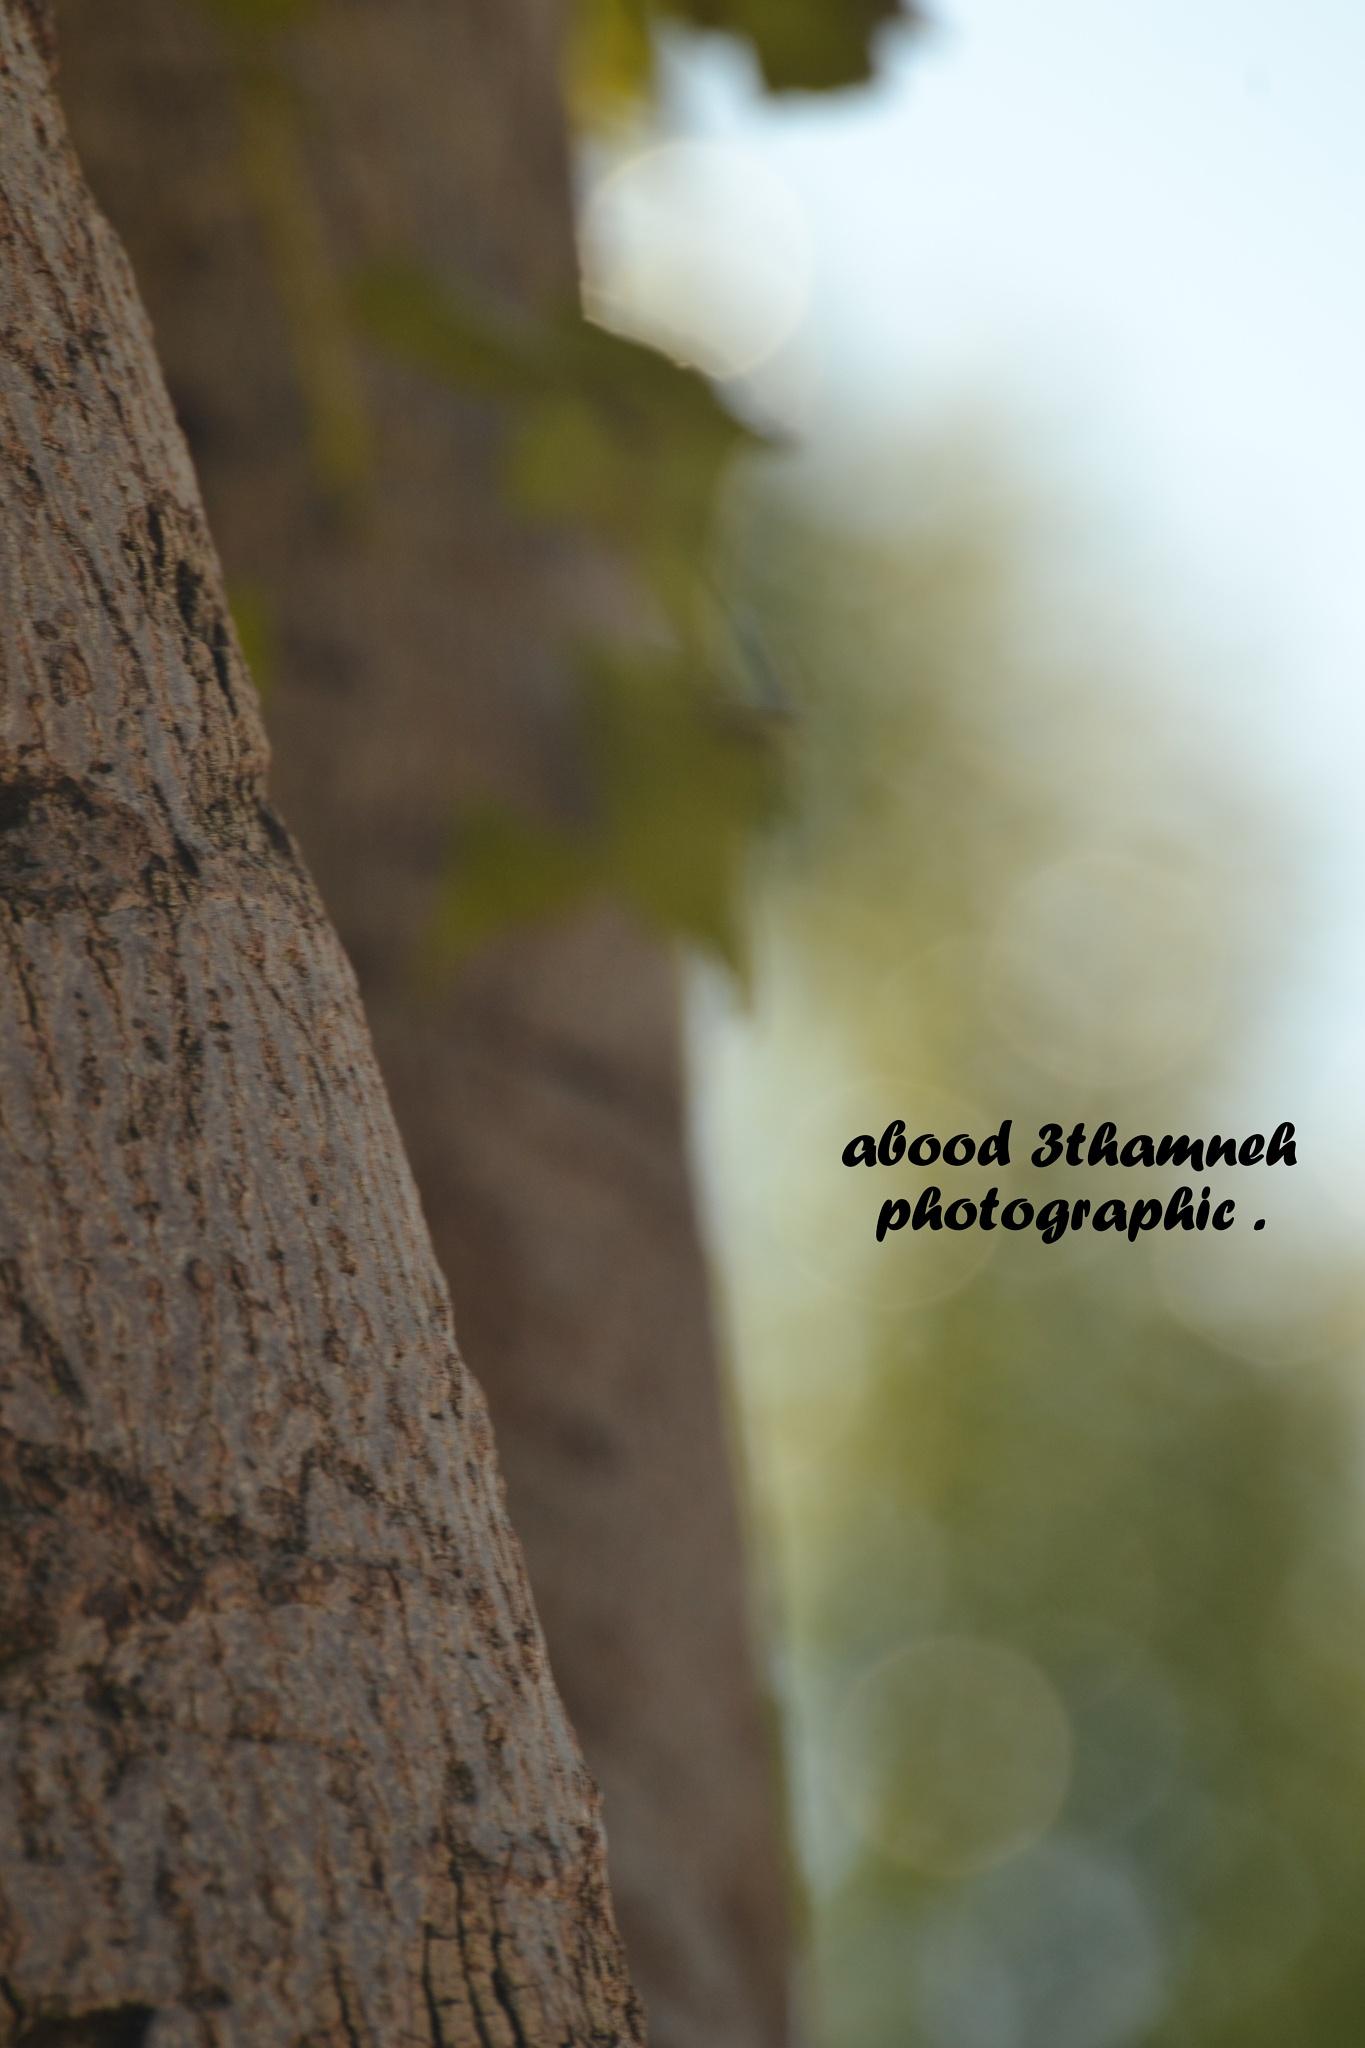 YOUR OPINON by Abood Slameh Alathmneh